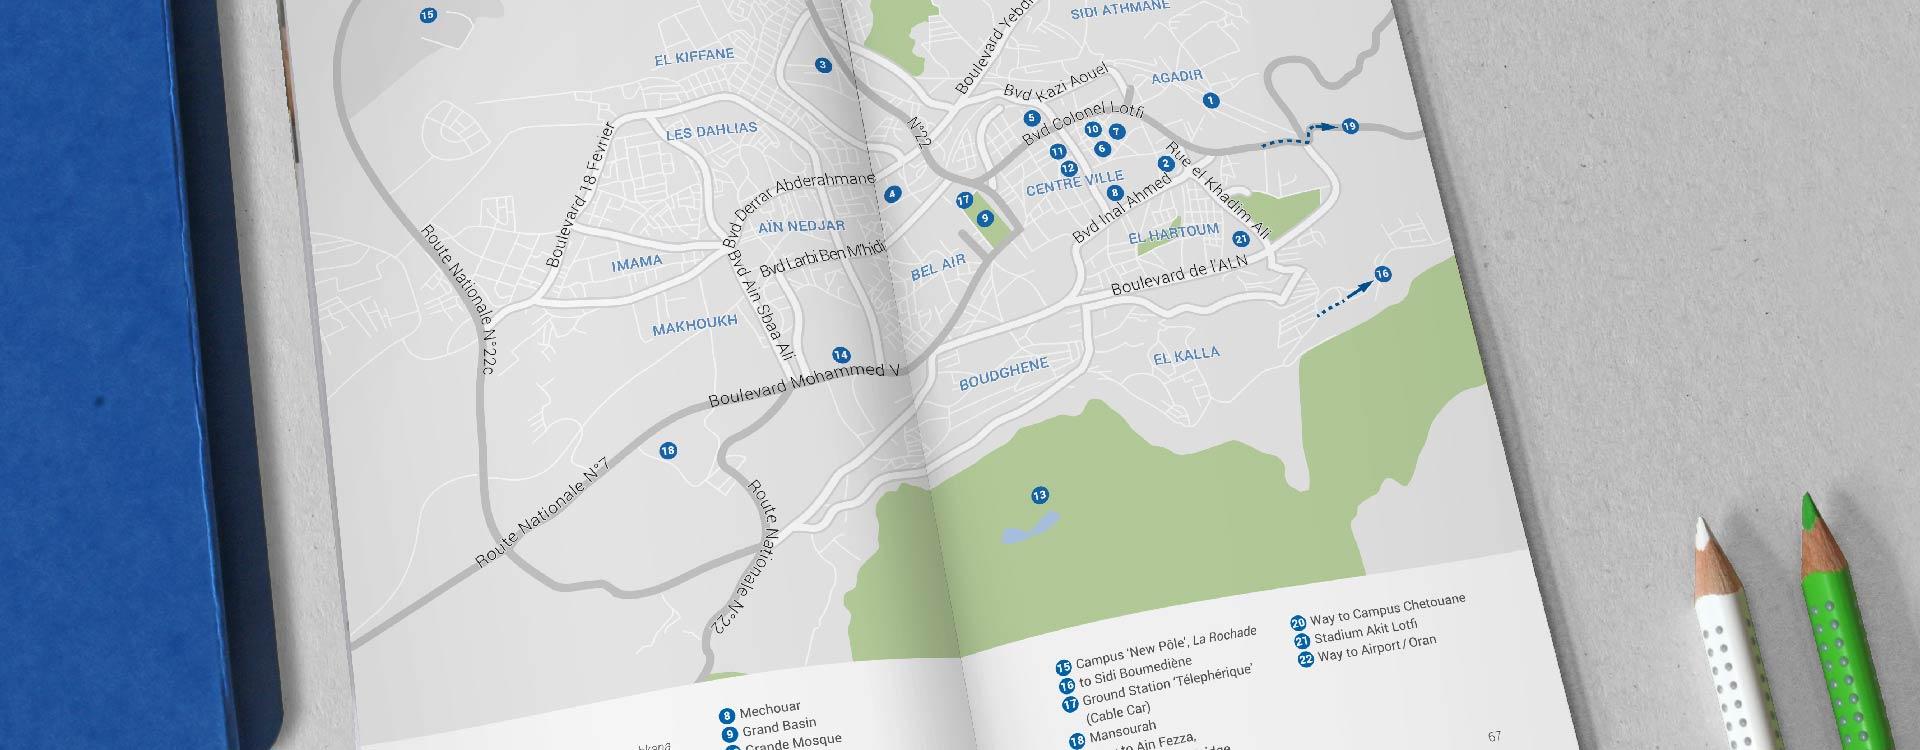 University Of Cincinnati Classroom Design Guide ~ Kattrin richter graphic design studio agency in